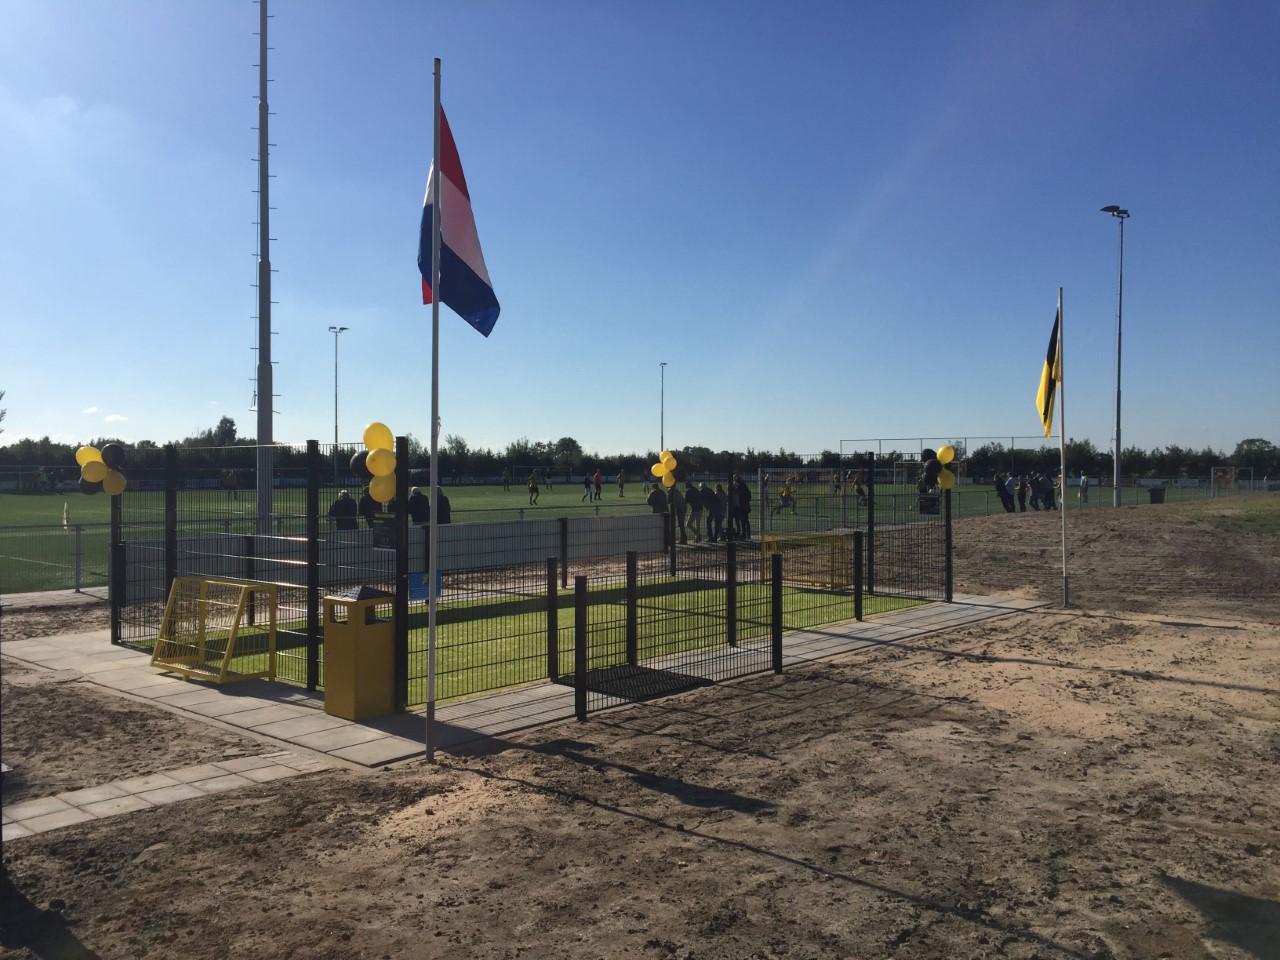 Foto Voetbalcourt 19 - Voetbalvereniging VV Haastrecht